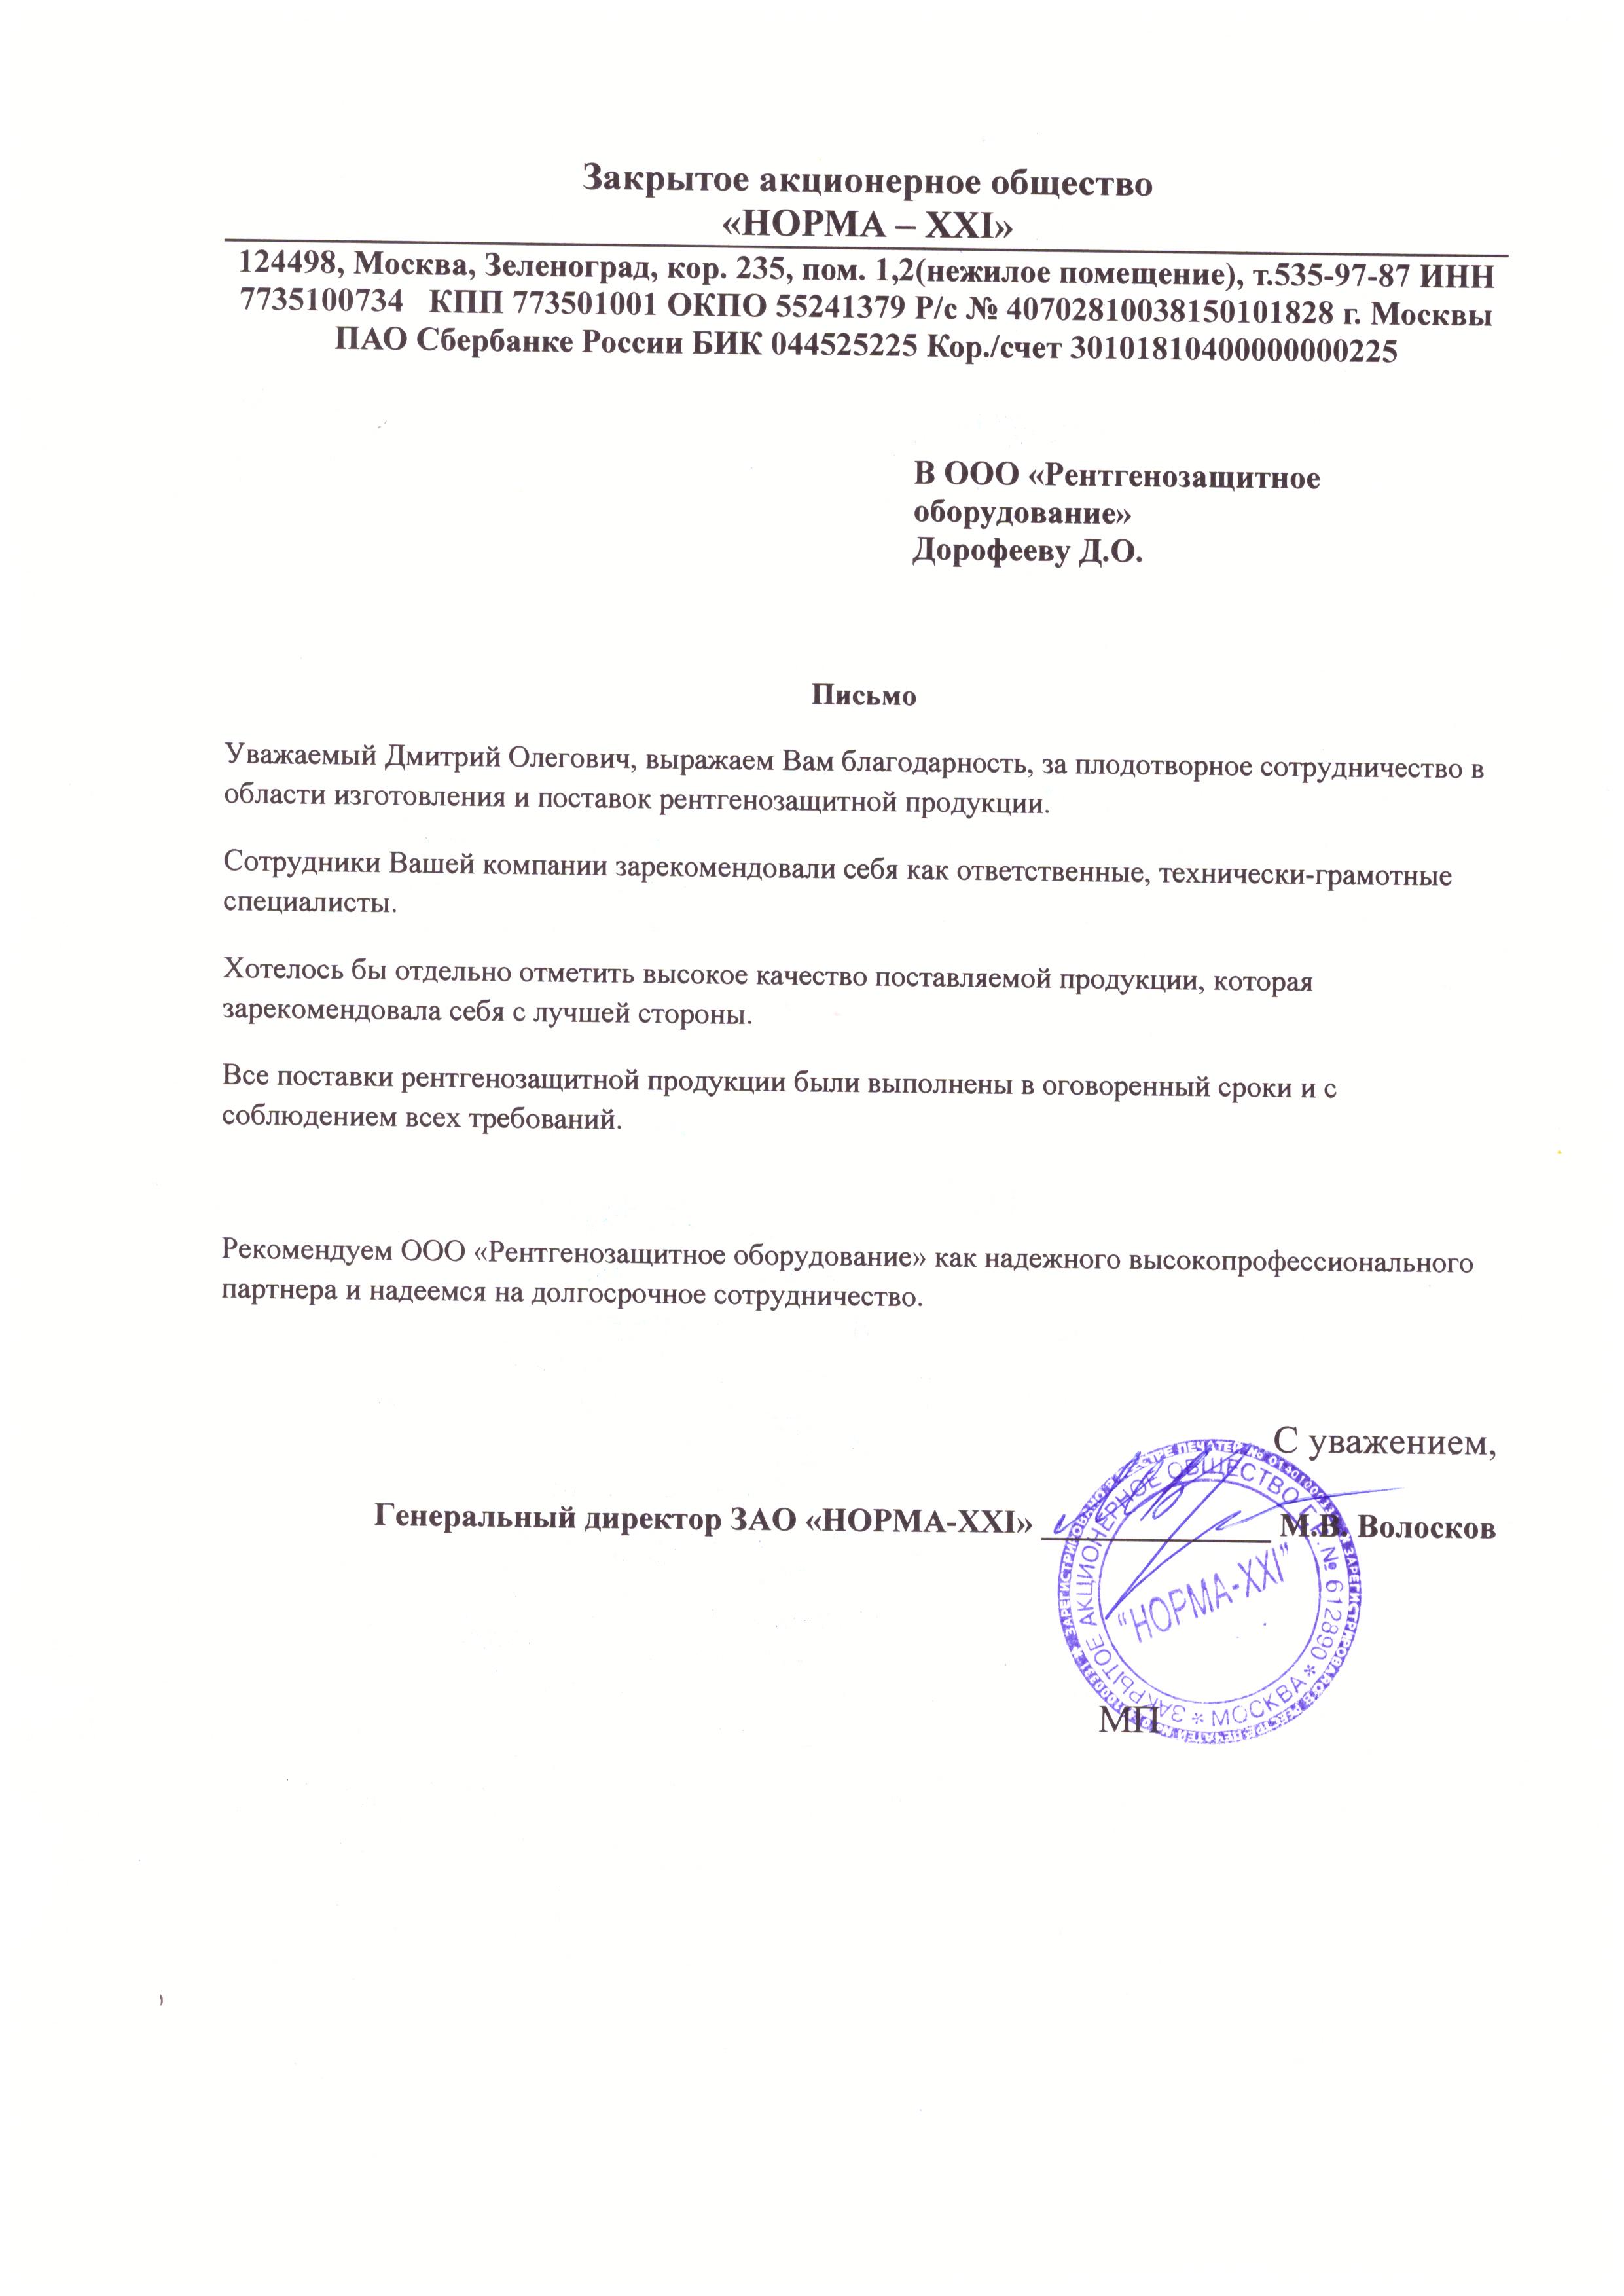 ЗАО «НОРМА-ХХI»